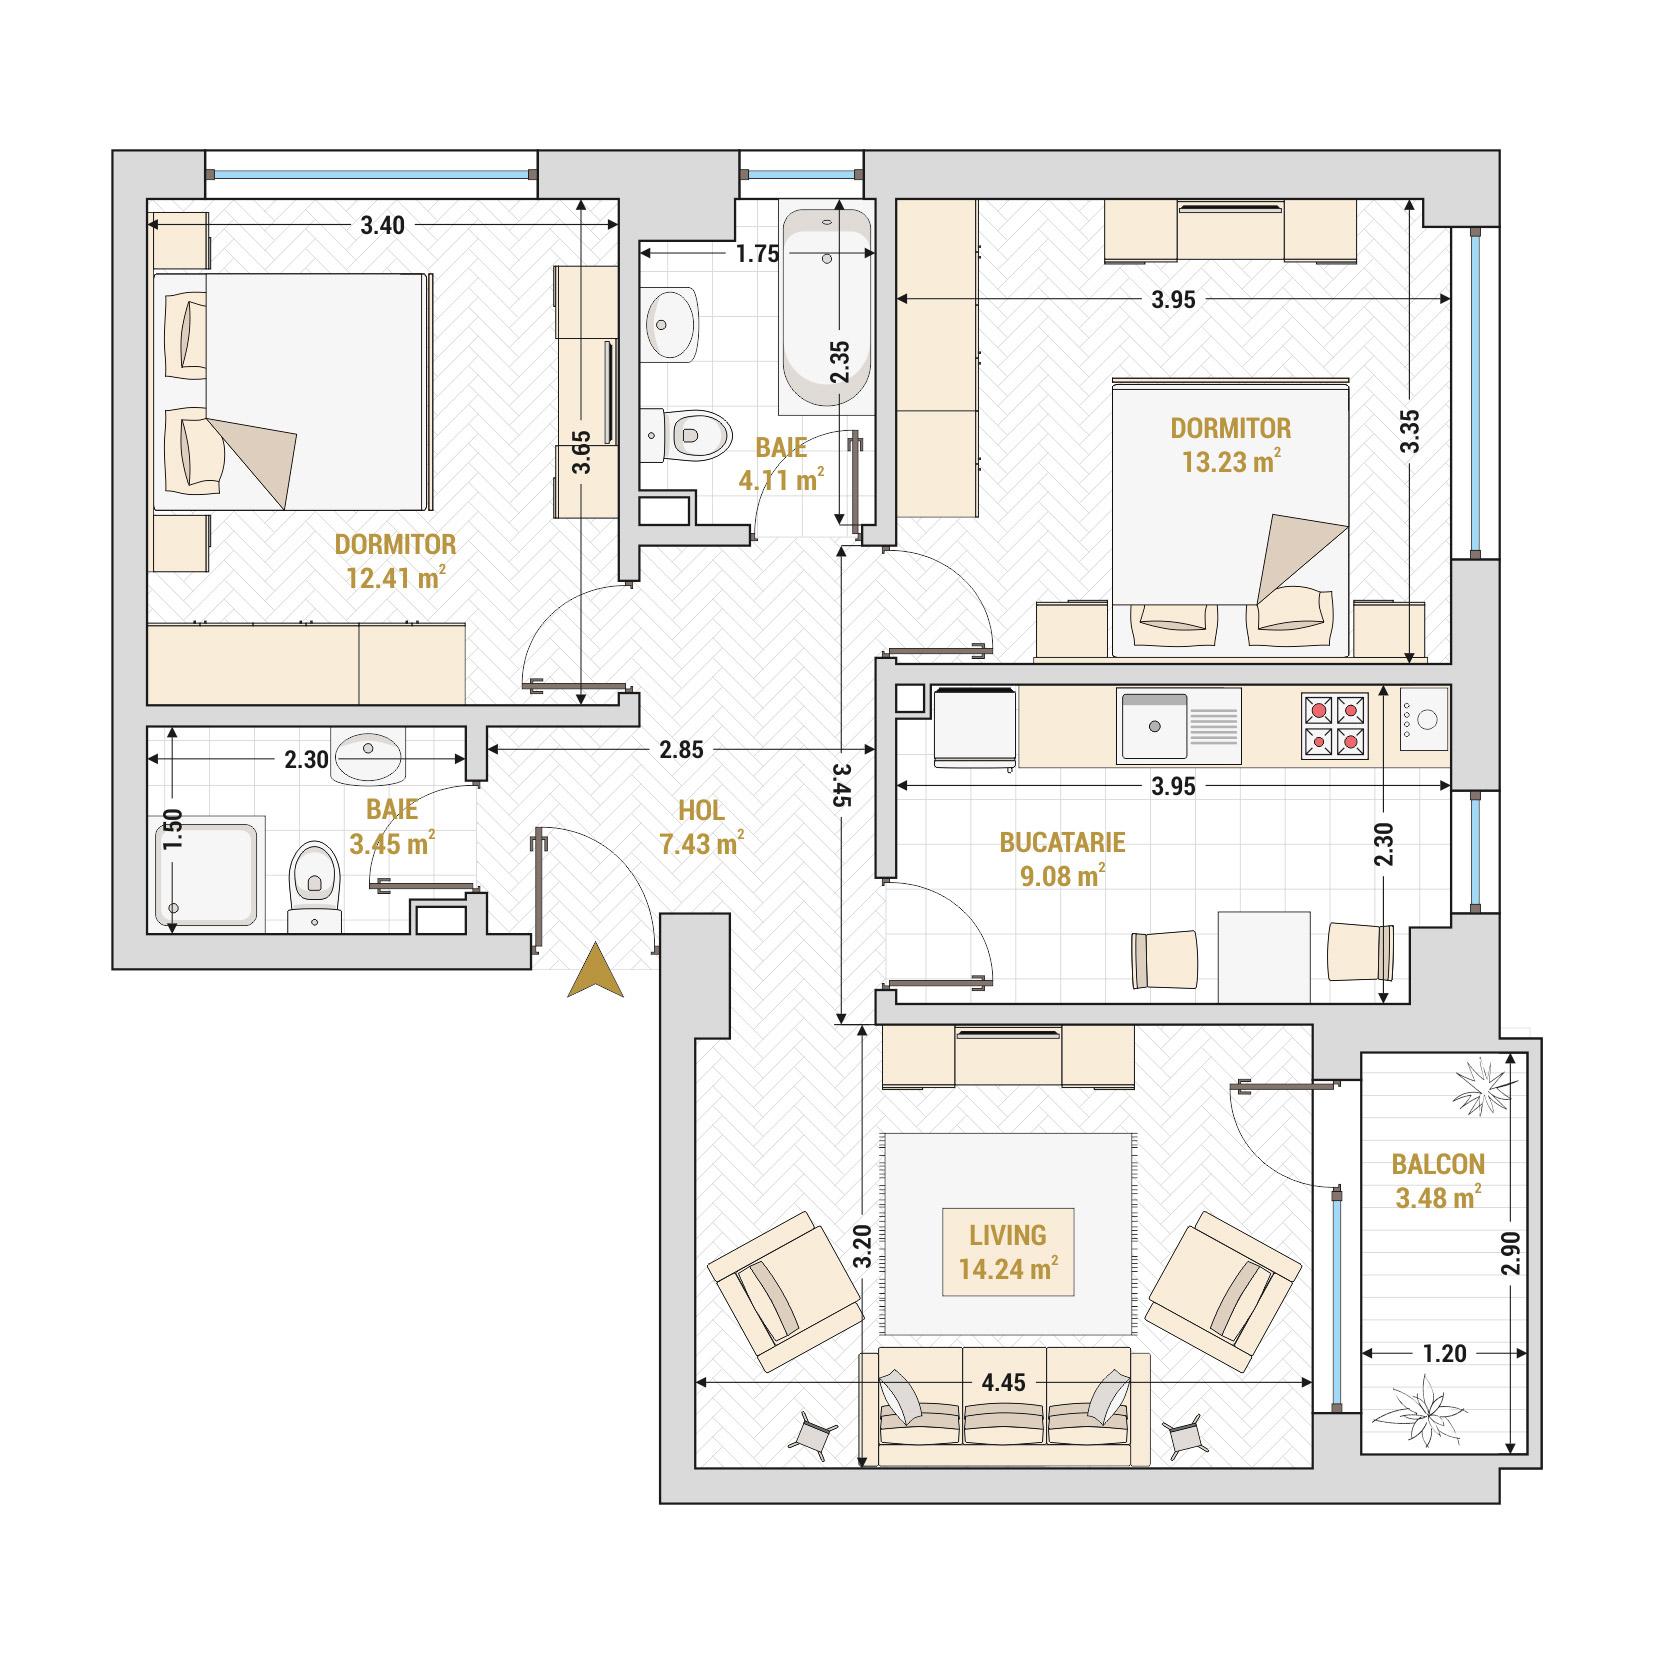 Apartament 3 camere de vanzare Bucuresti - Catedral Residence - Marriott, Piata Unirii, 13 Septembrie, Izvor - Tip 1 - T2A